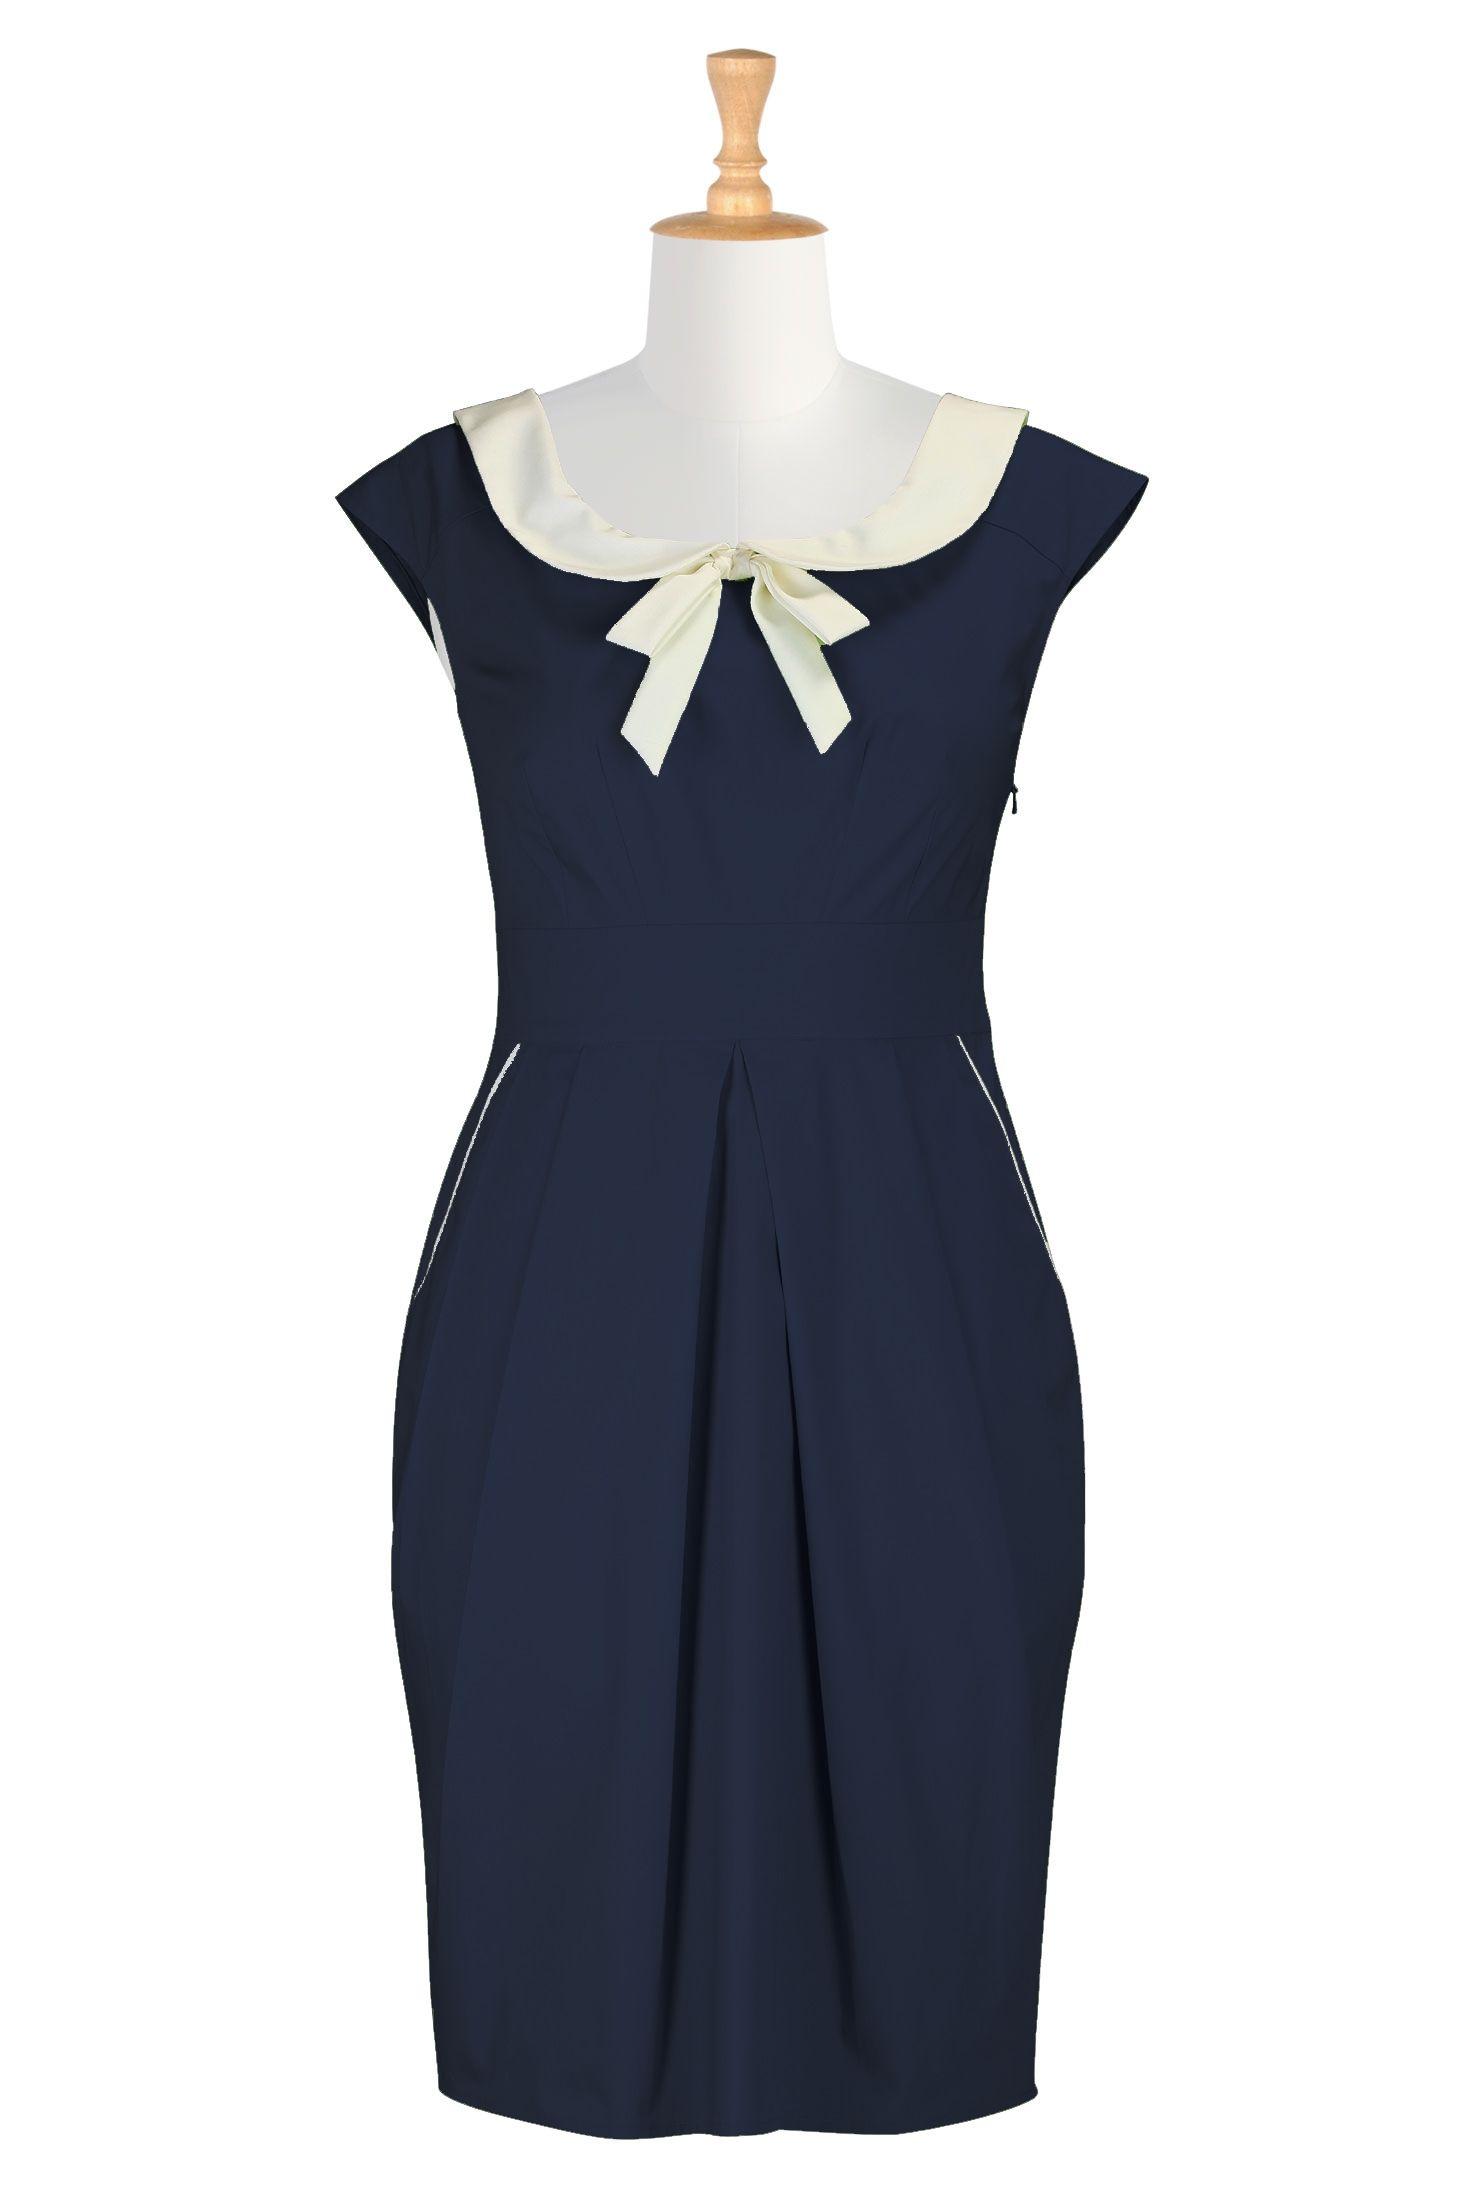 Womenus short dresses evening dresses cocktail prom dresses